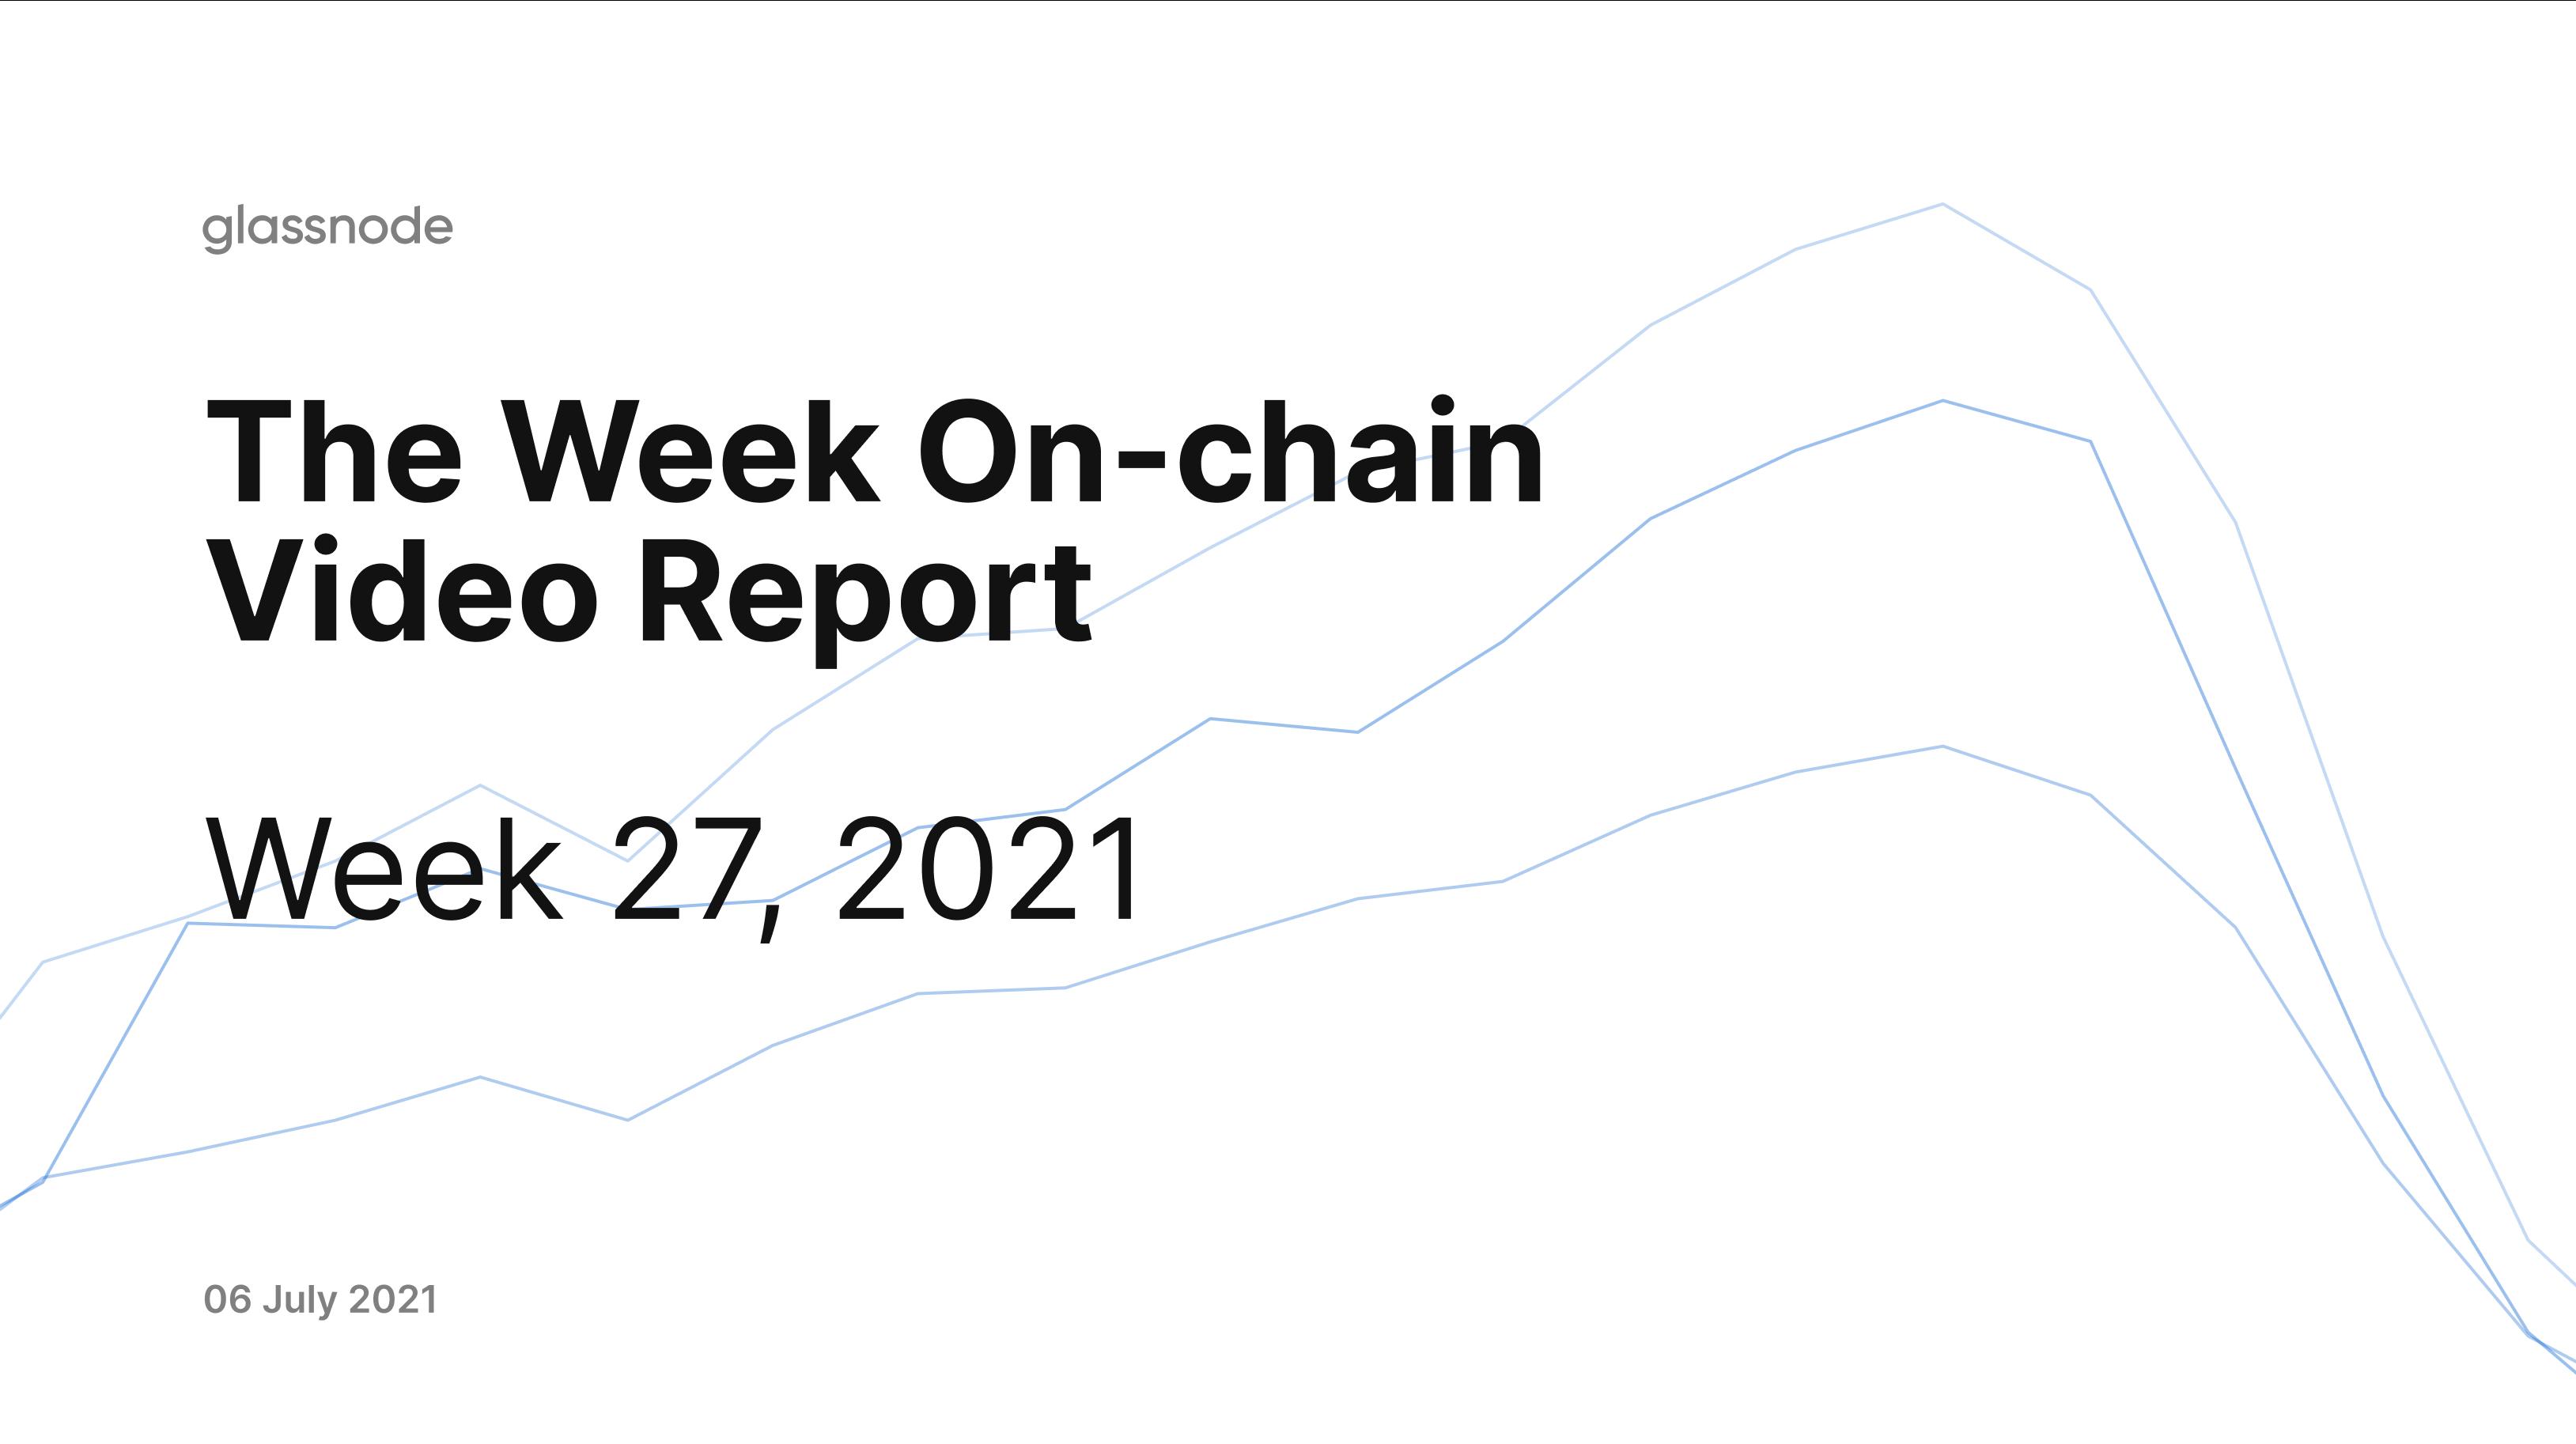 The Week On-chain (Week 28, 2021)